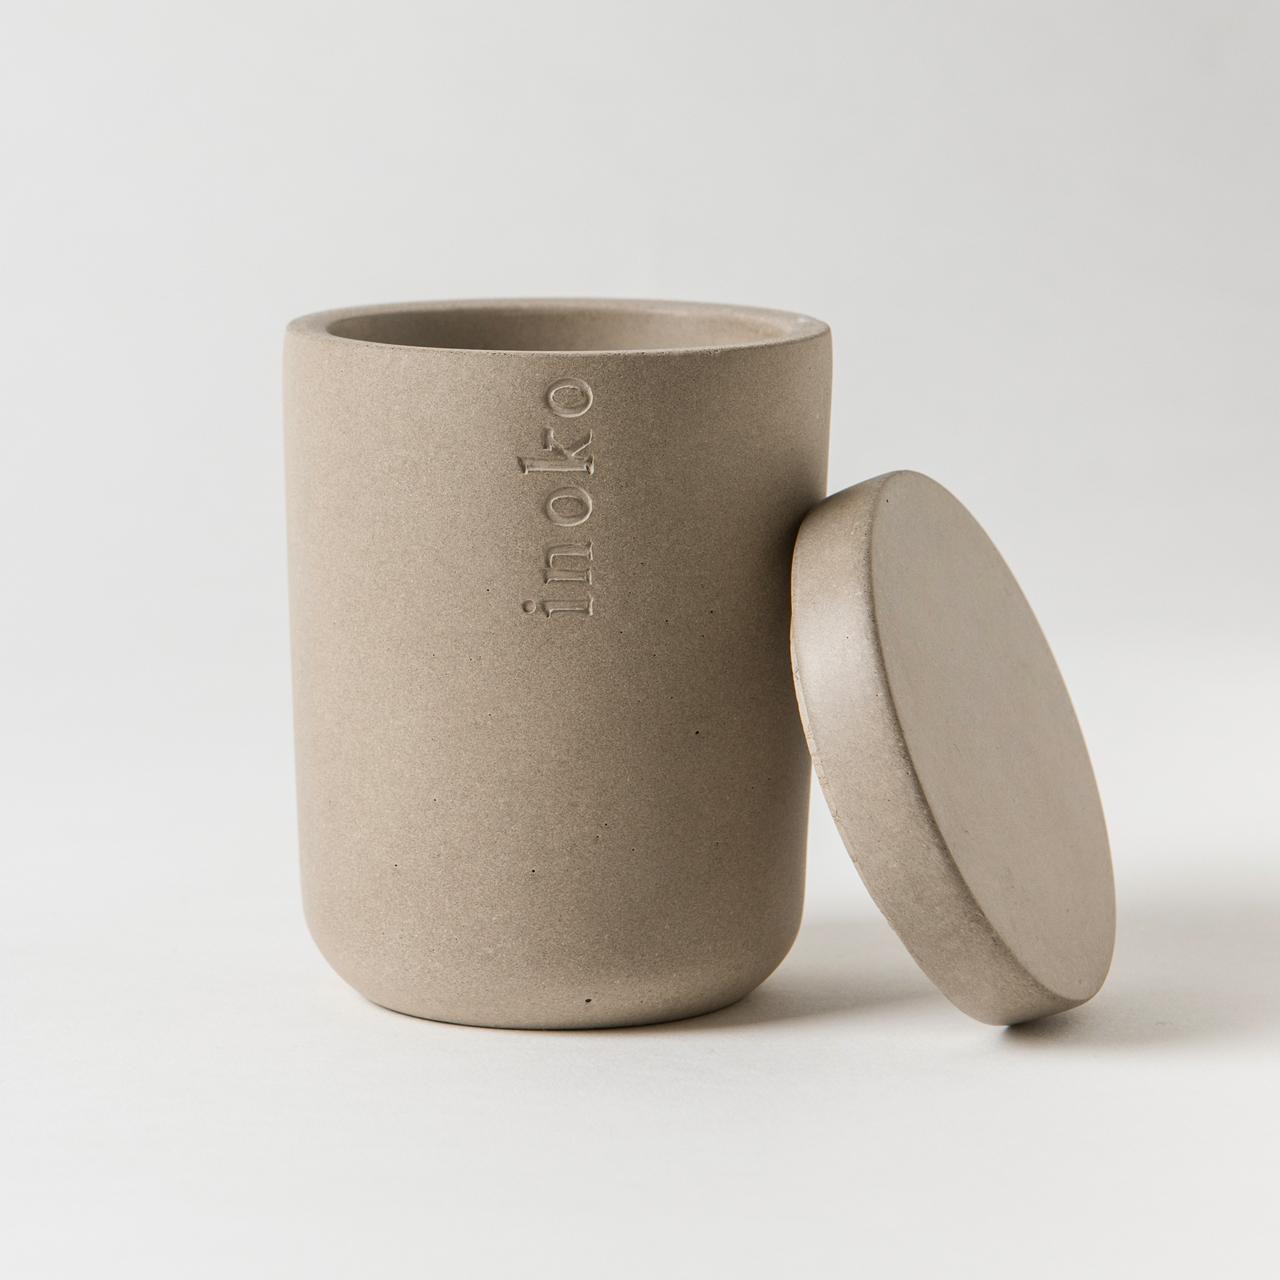 Inoko concrete vessel | The Design Gift Shop